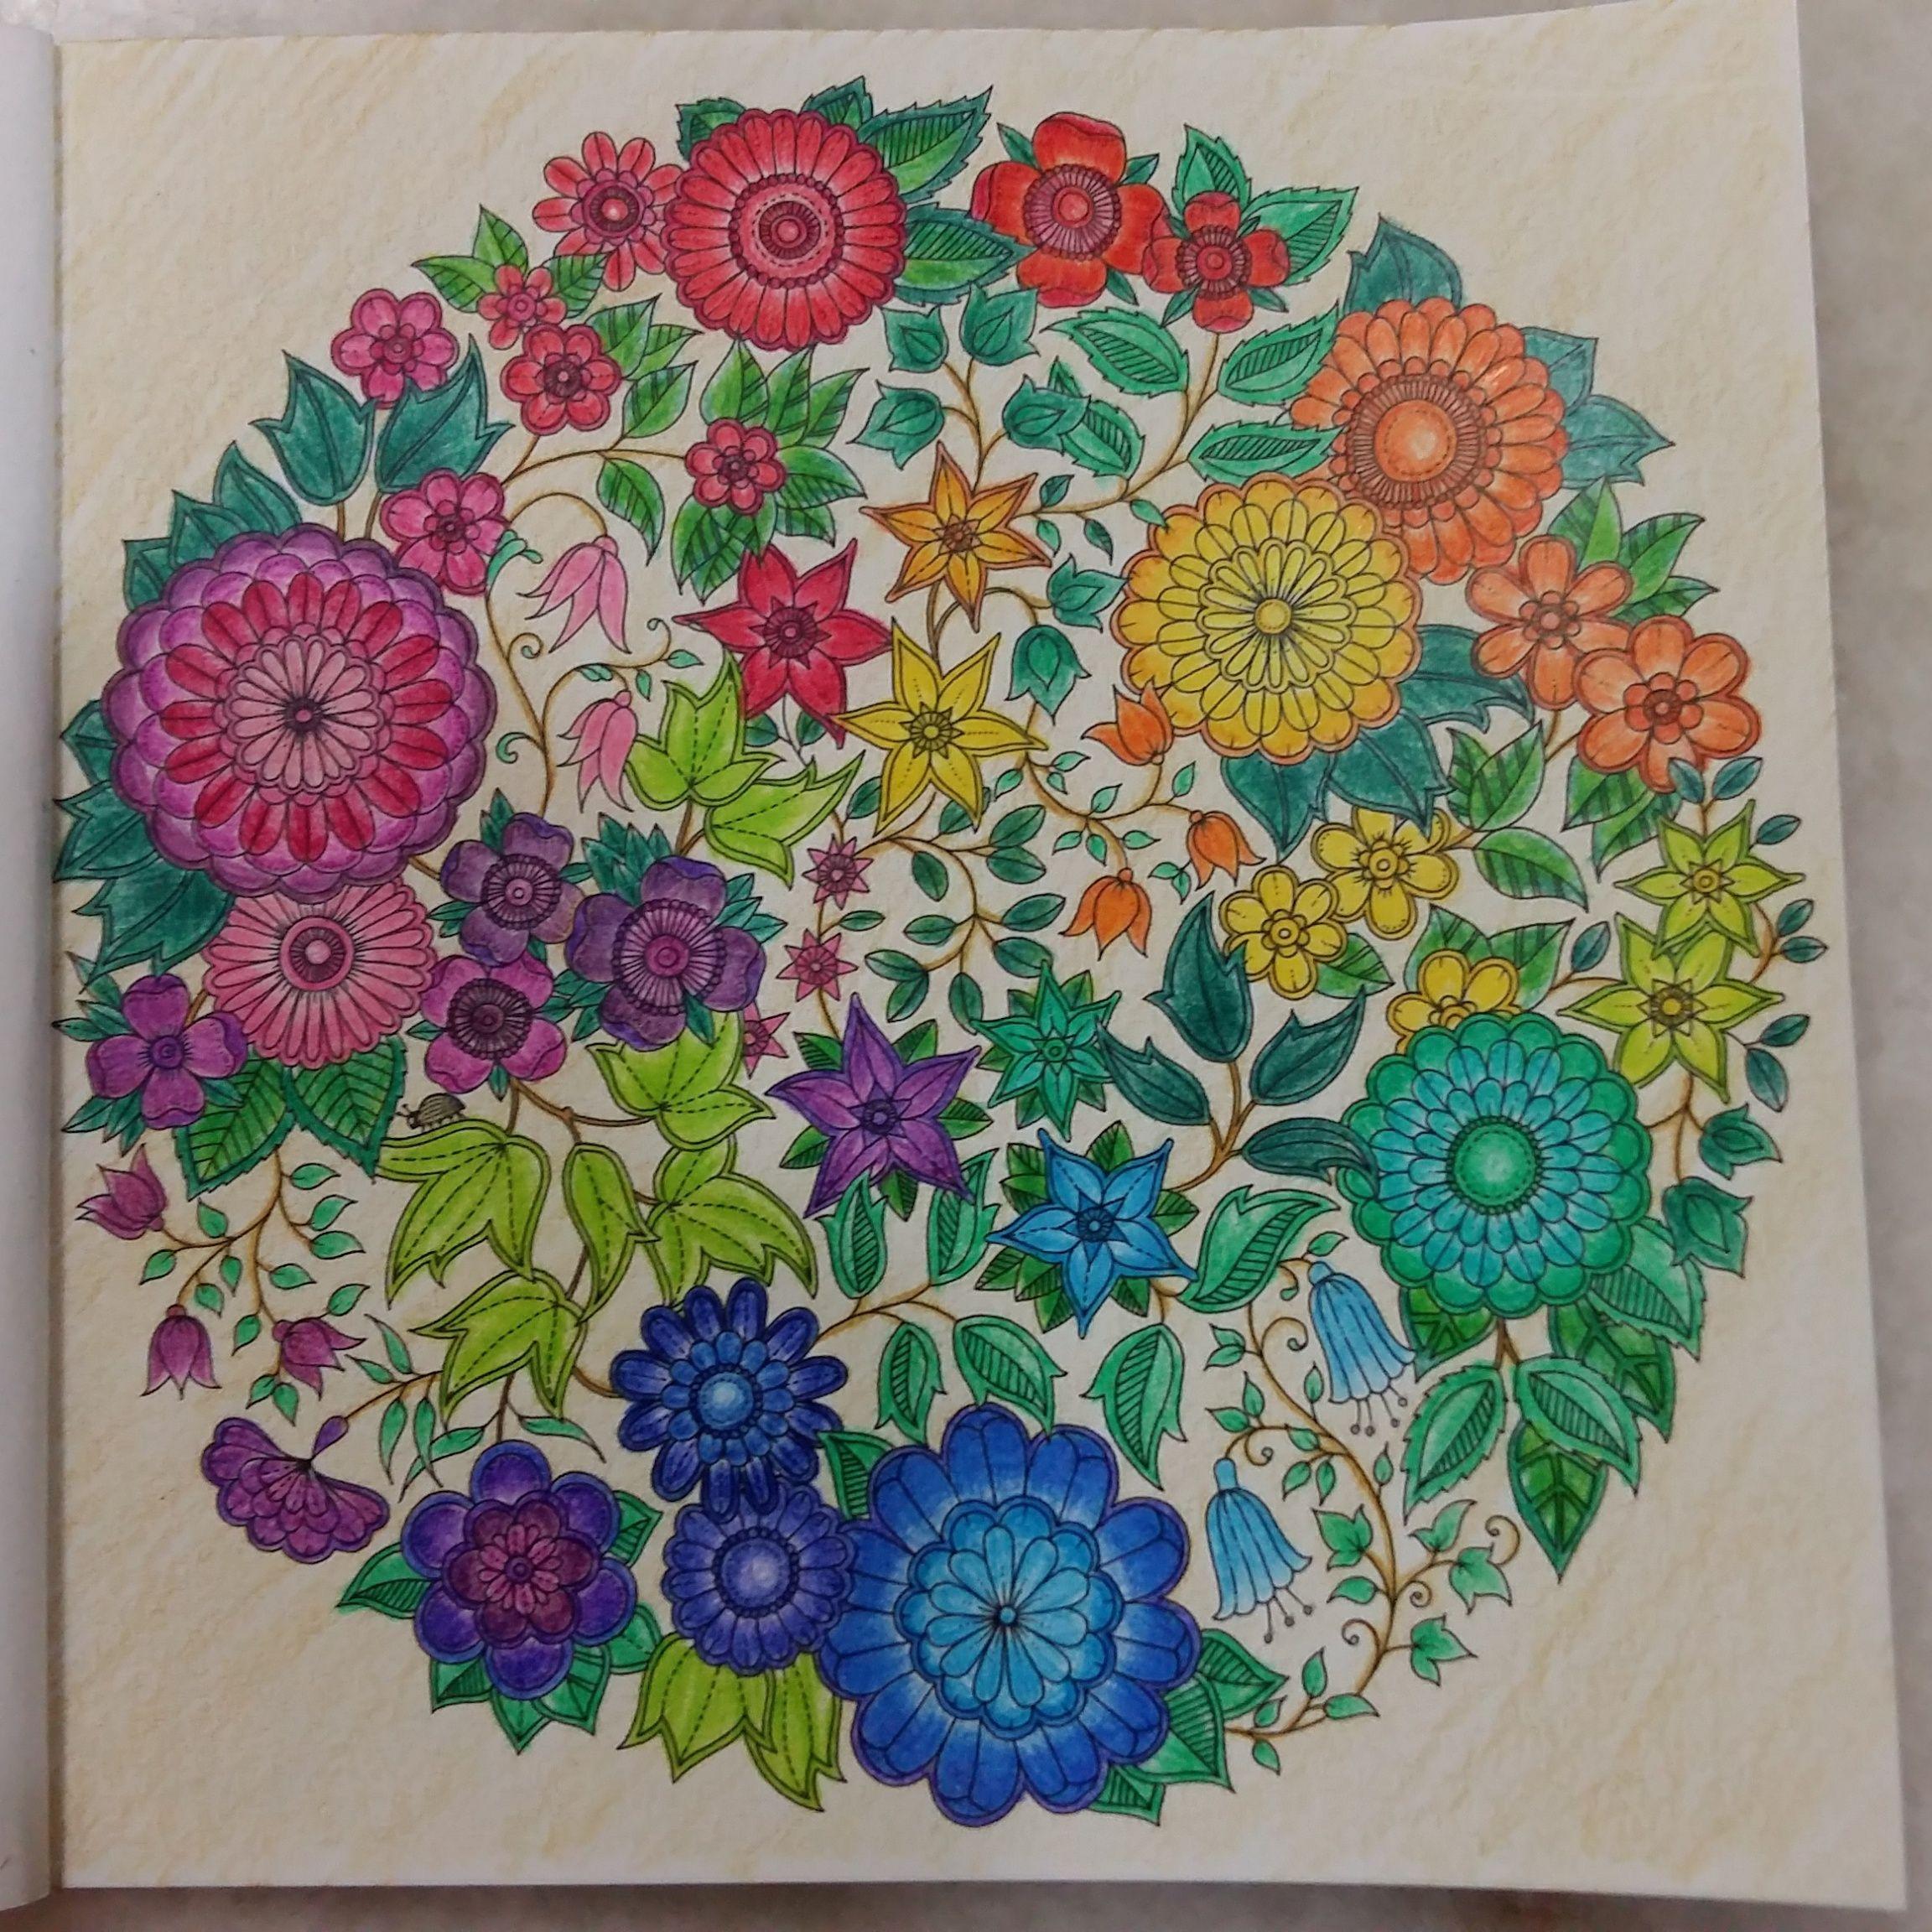 SecretGarden Coloringbook Rainbow Flowers